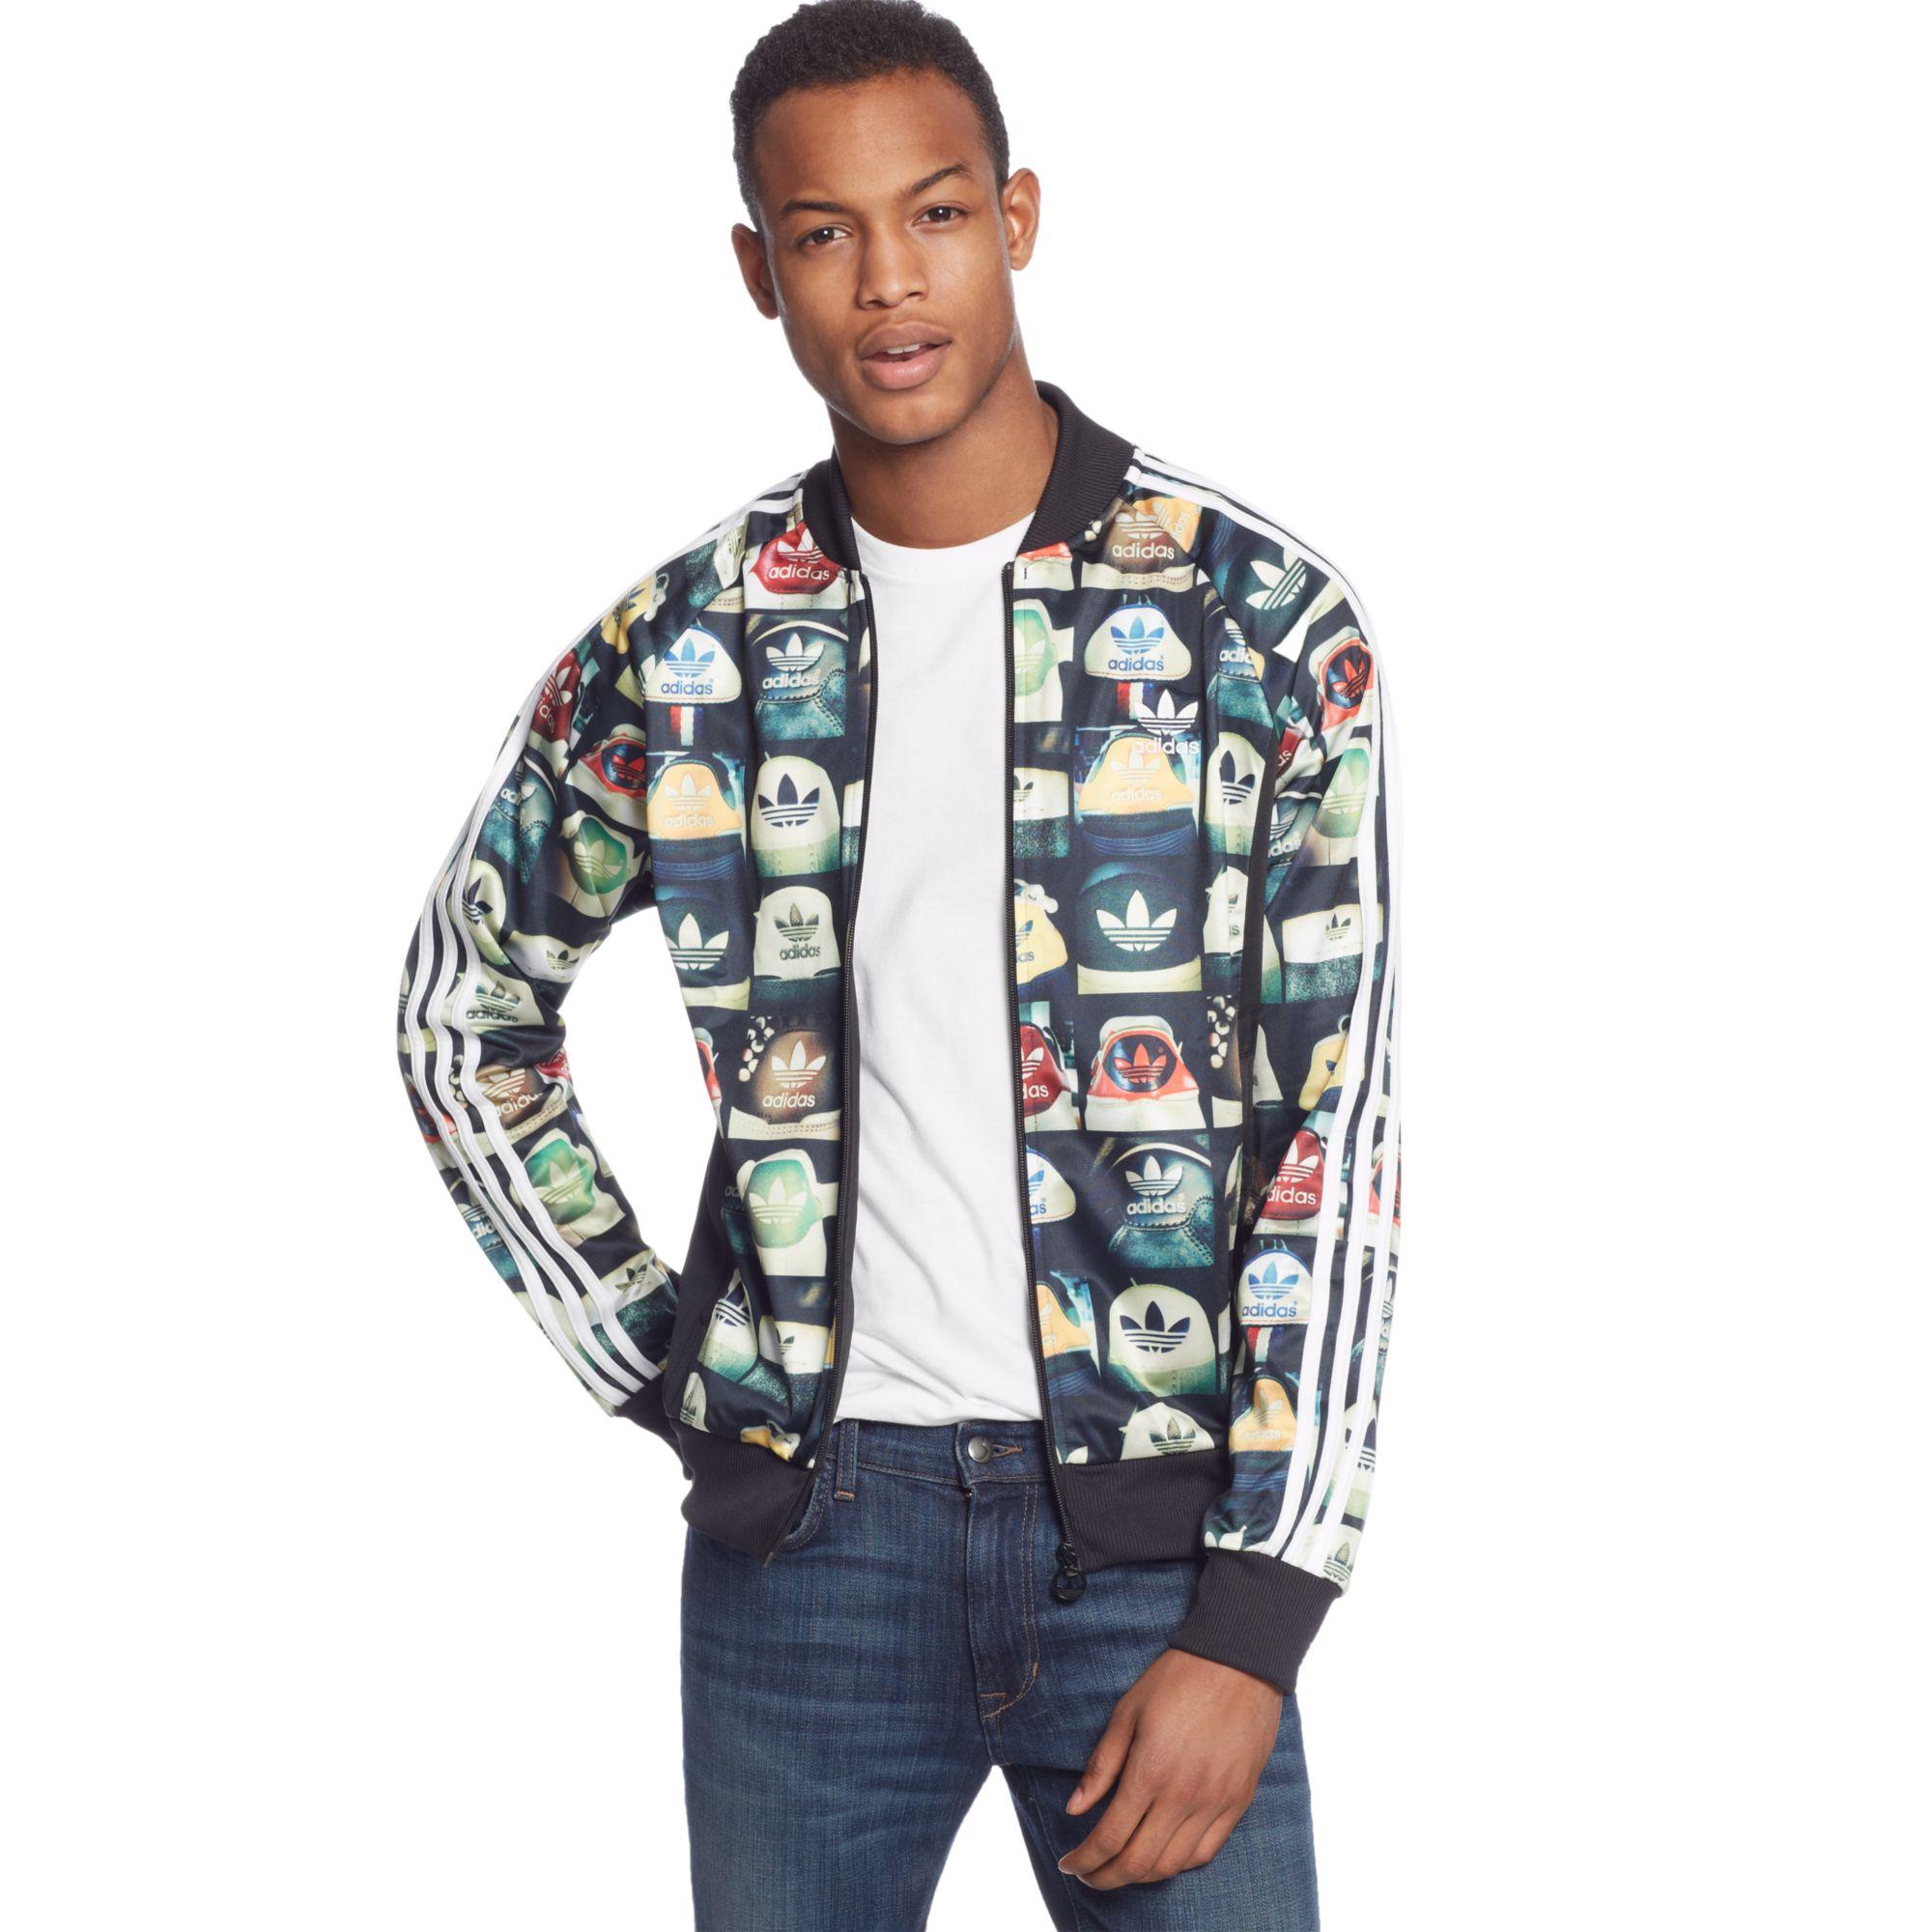 da60669924db Lyst - adidas Originals Allover Print Superstar Track Jacket in ...